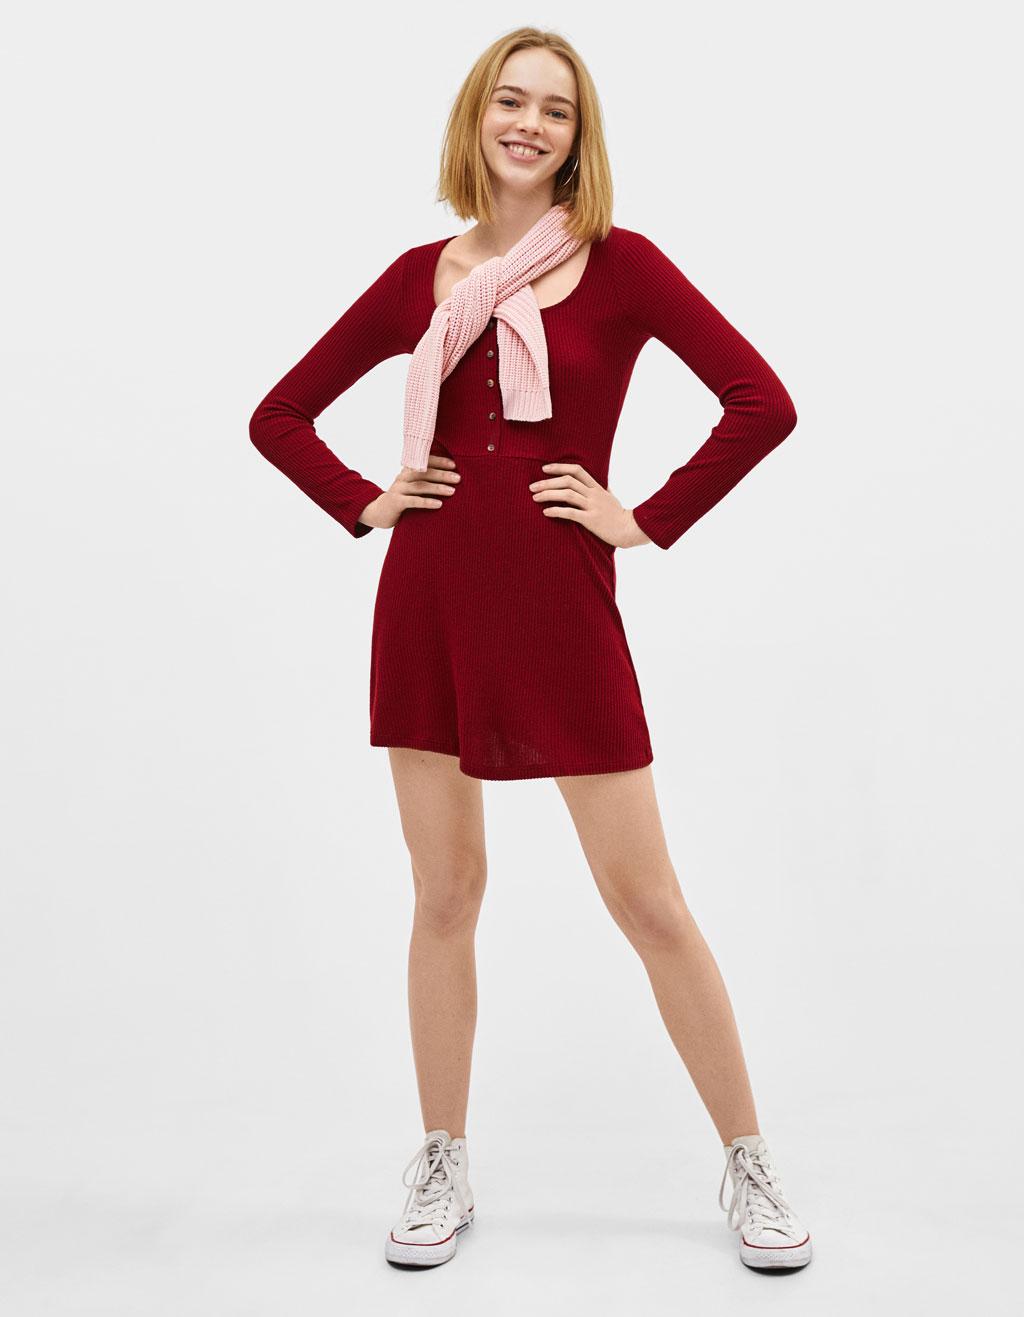 Ribtricot jurk met knopen